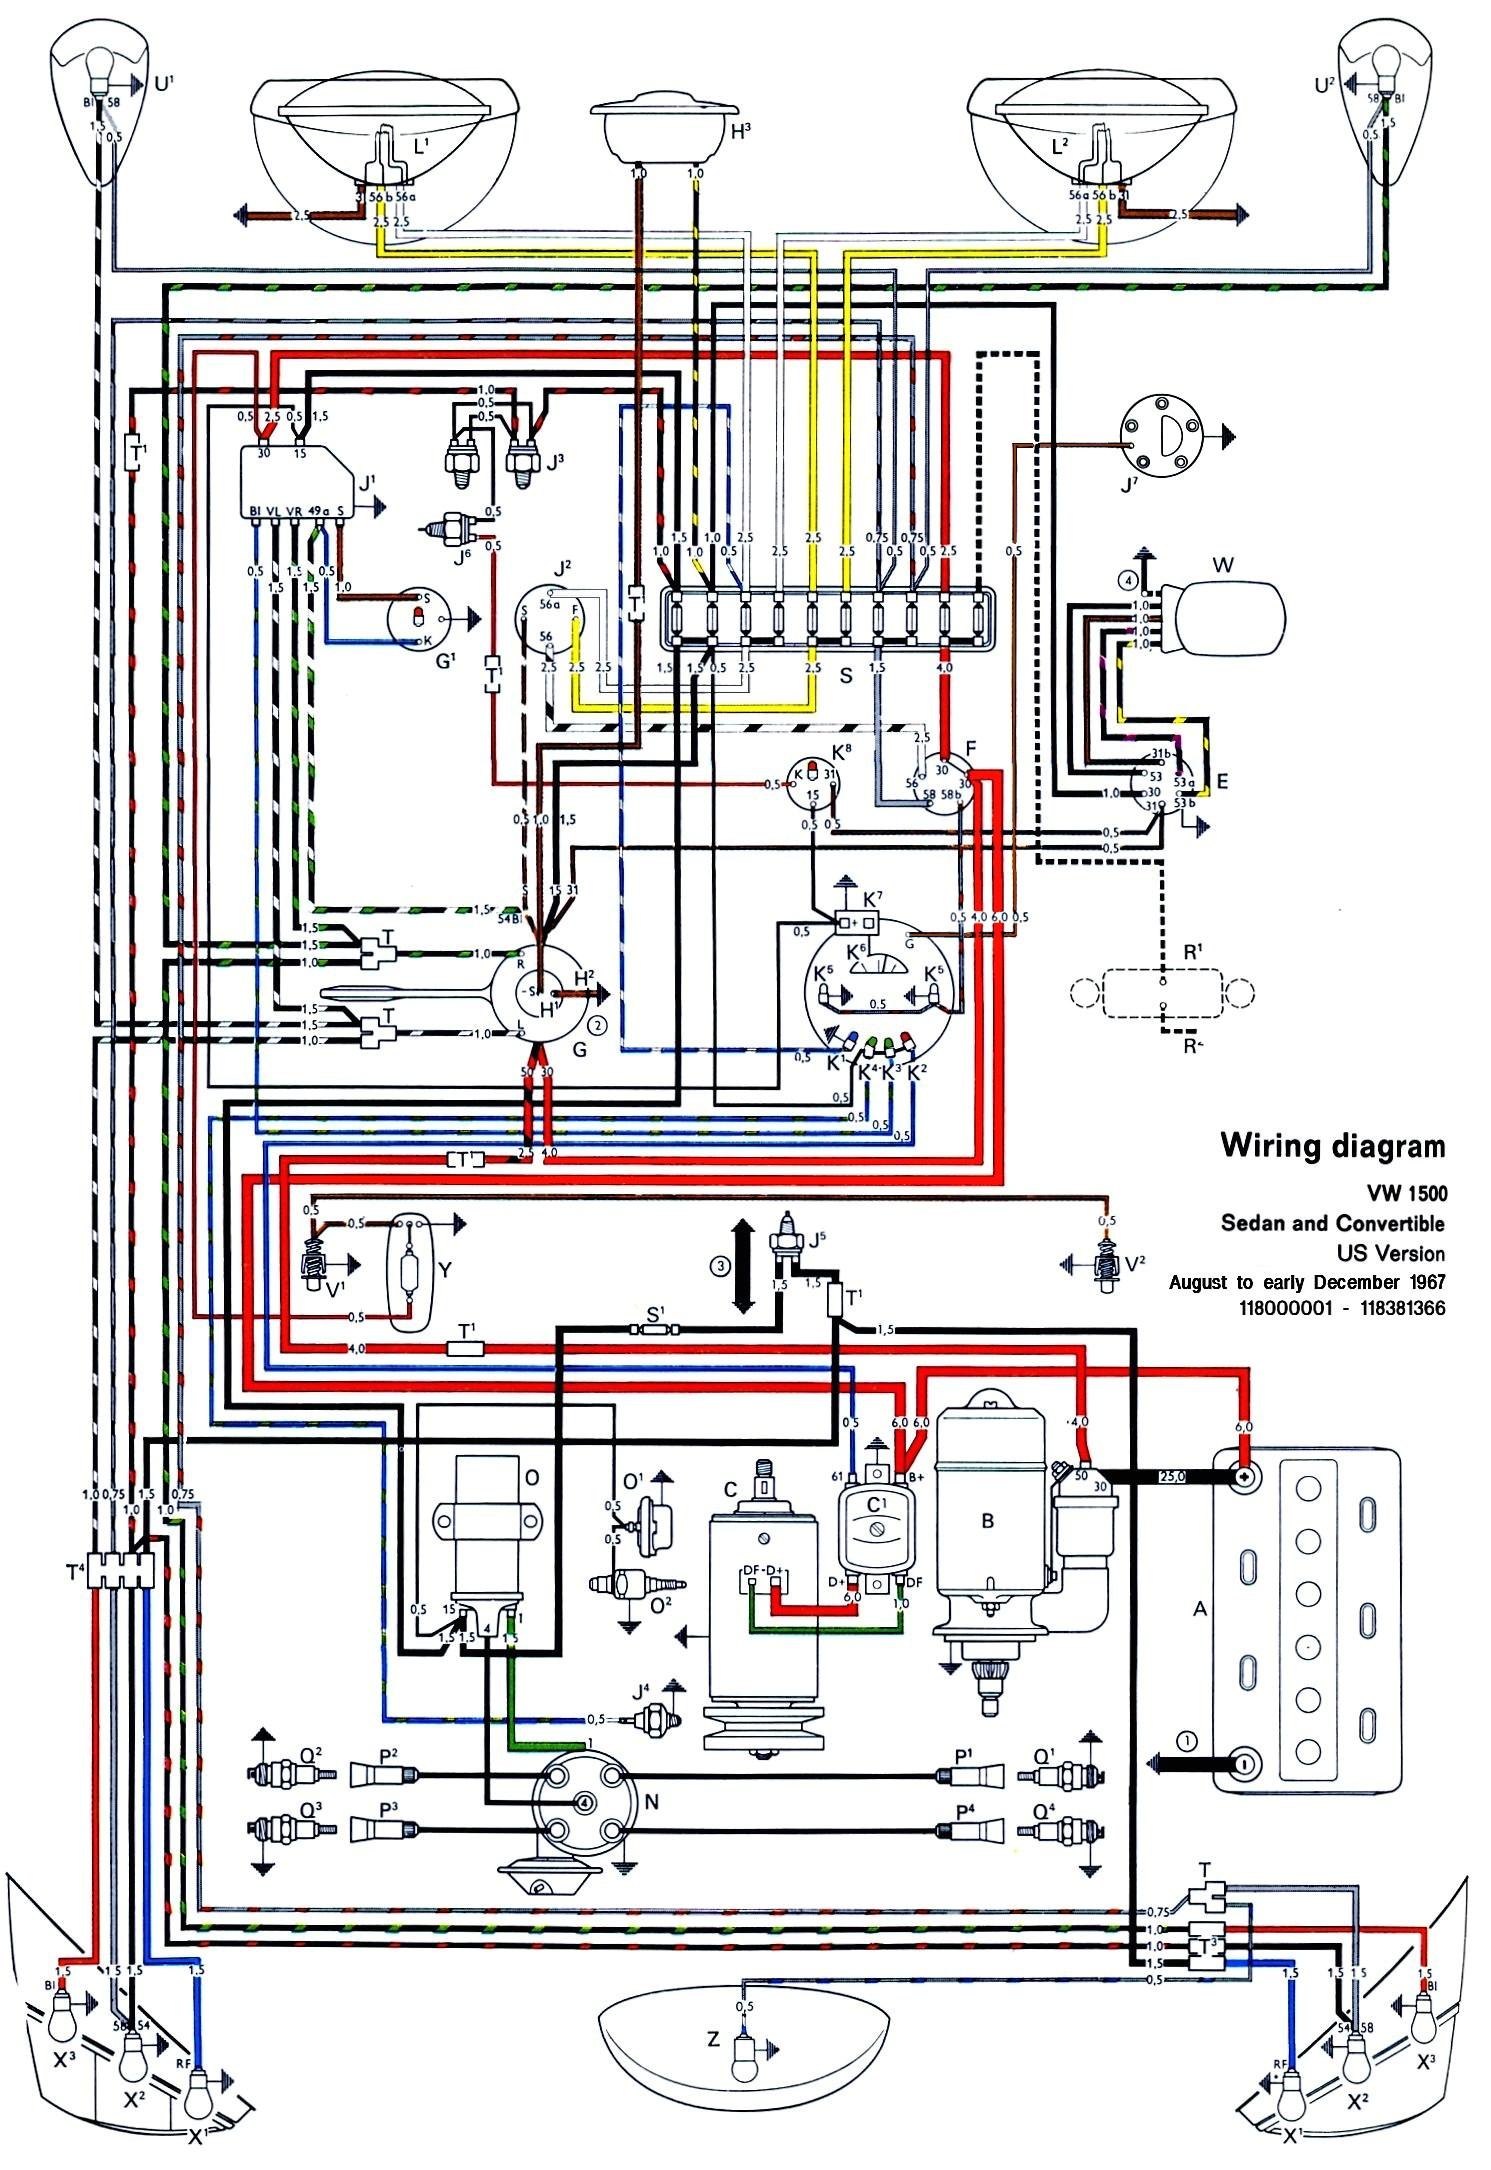 1973 vw wiring harness wiring diagram database wiring diagrams 1973 beetle